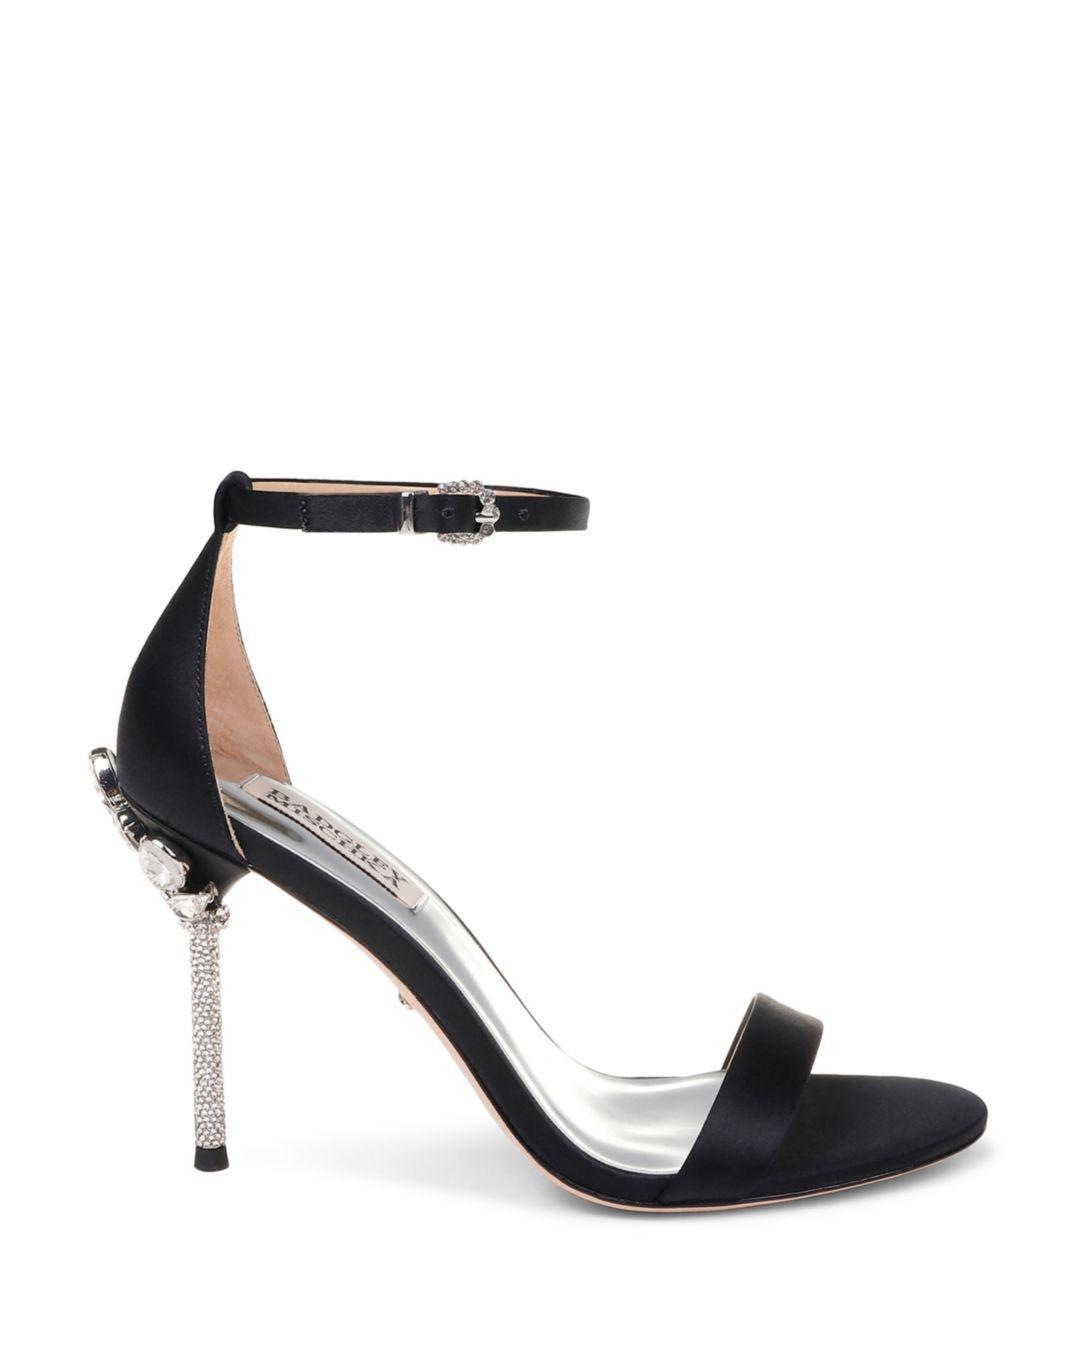 ee0927232fd Lyst - Badgley Mischka Women s Vicia Embellished Satin High-heel Sandals in  Black - Save 30%